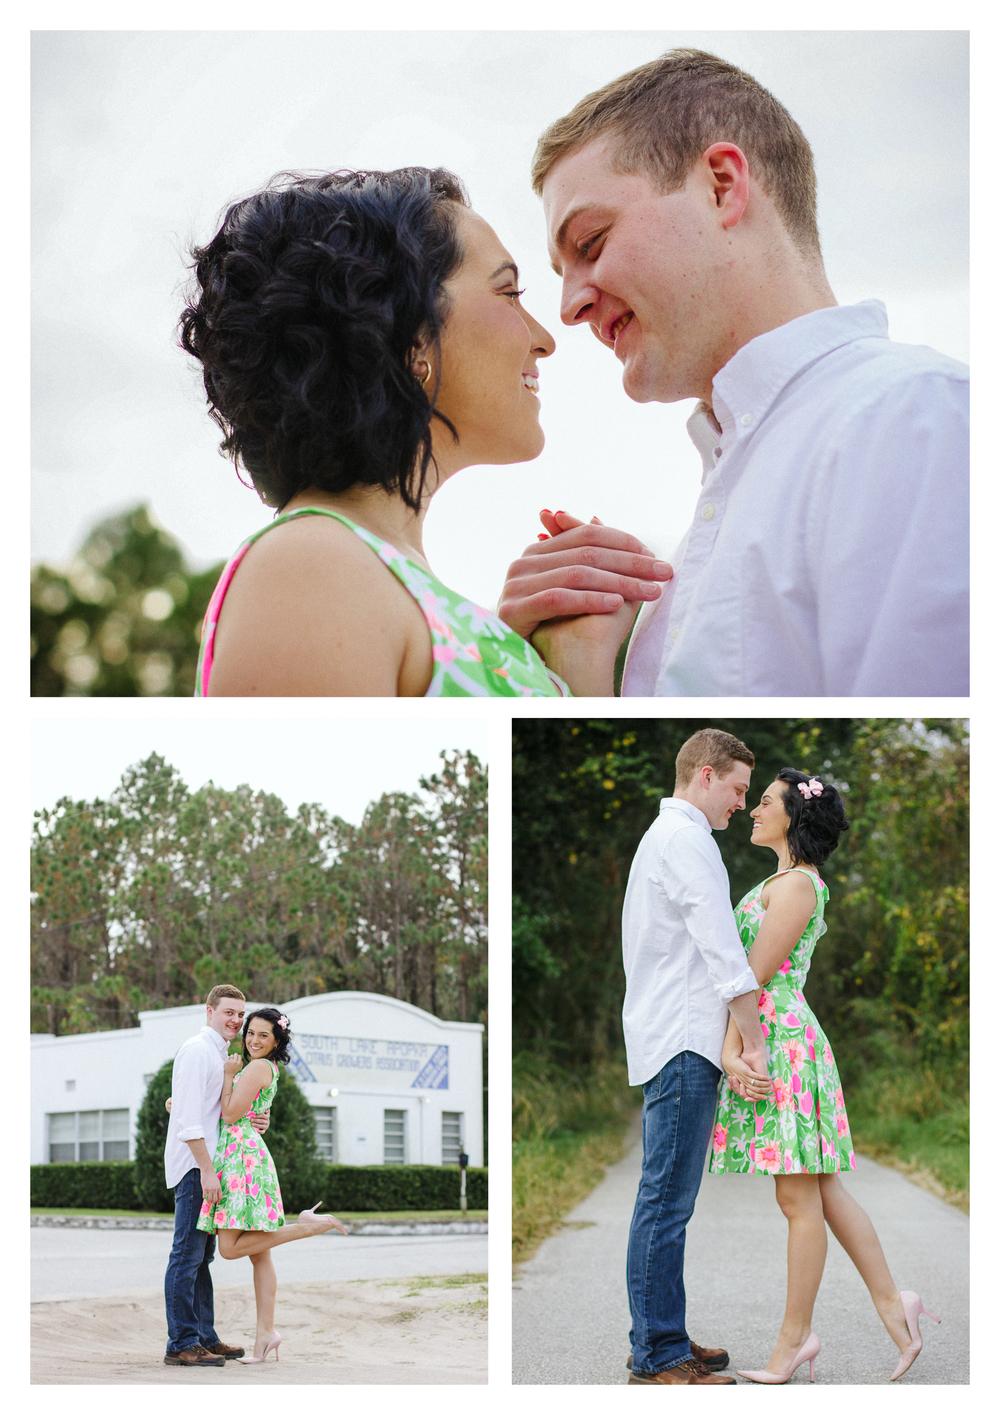 Matt + Victoria | Military Engagement Shoot | www.kristalajara.com